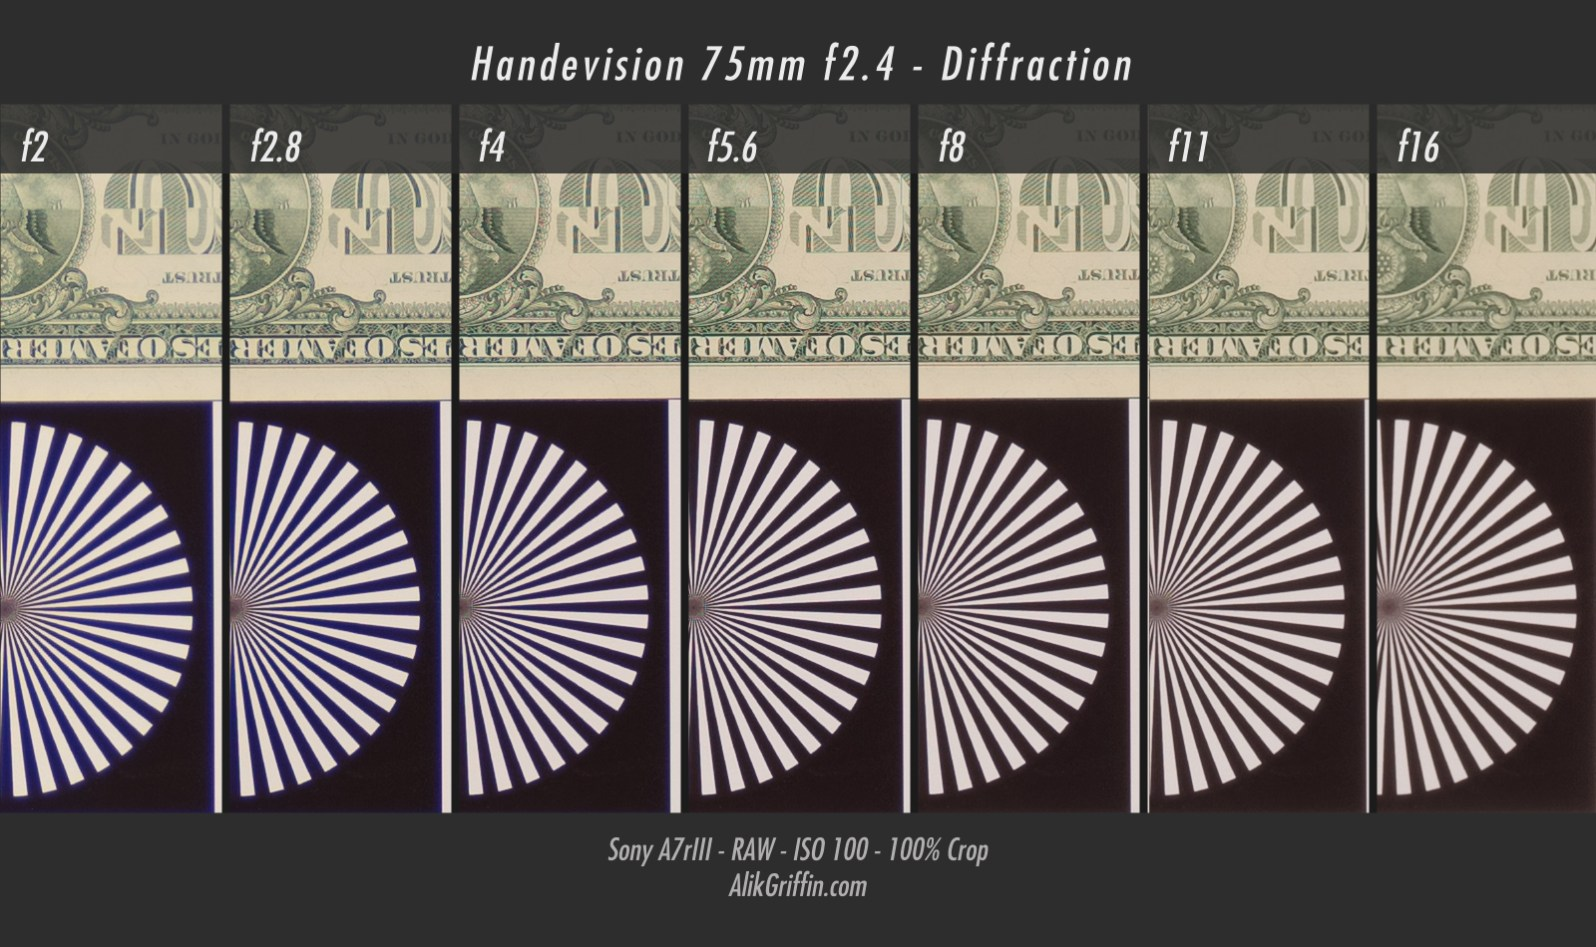 IBERIT 75mm Diffraction